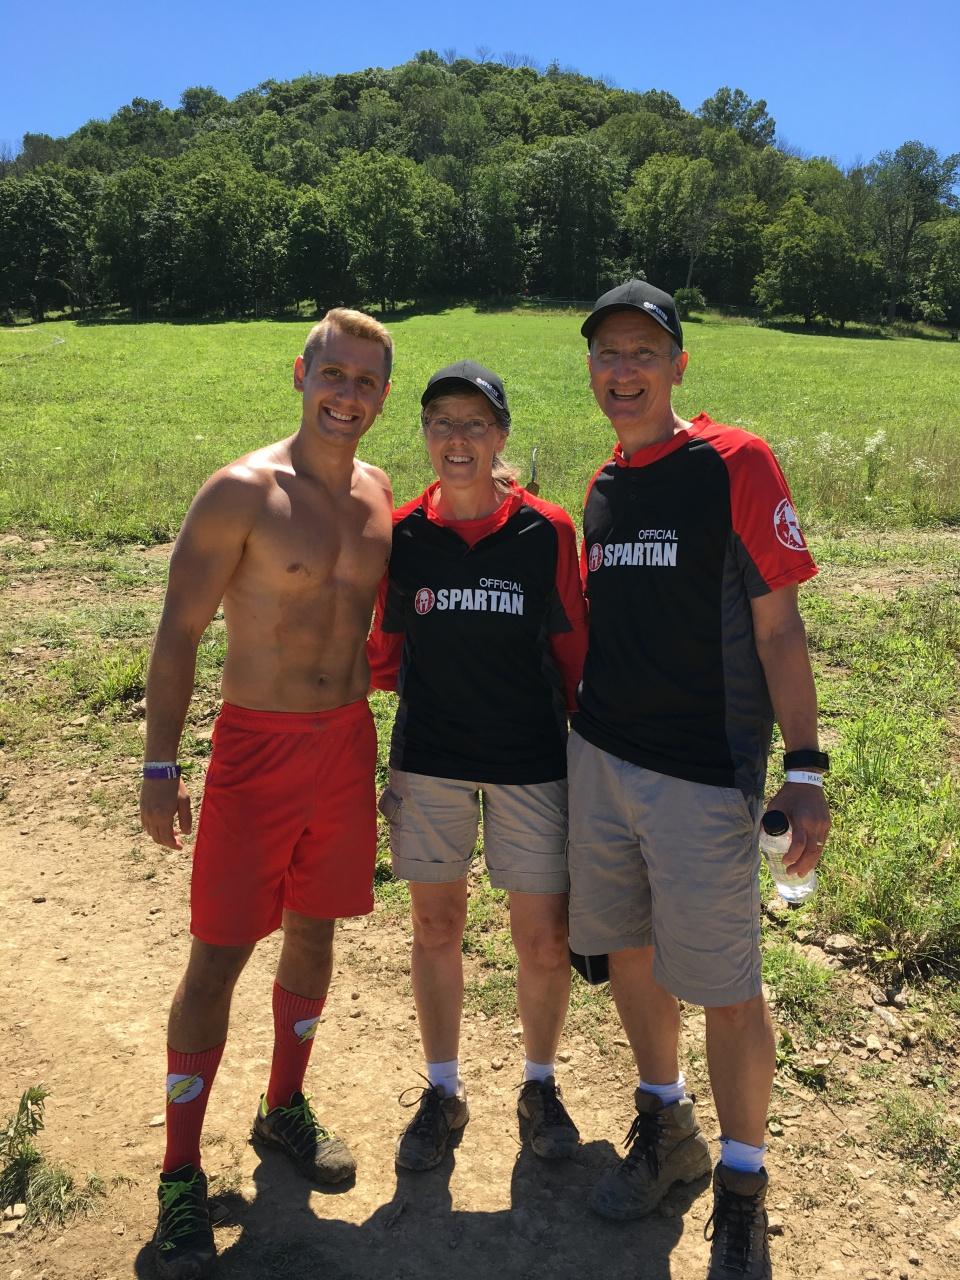 Spartan Sprint parents and son